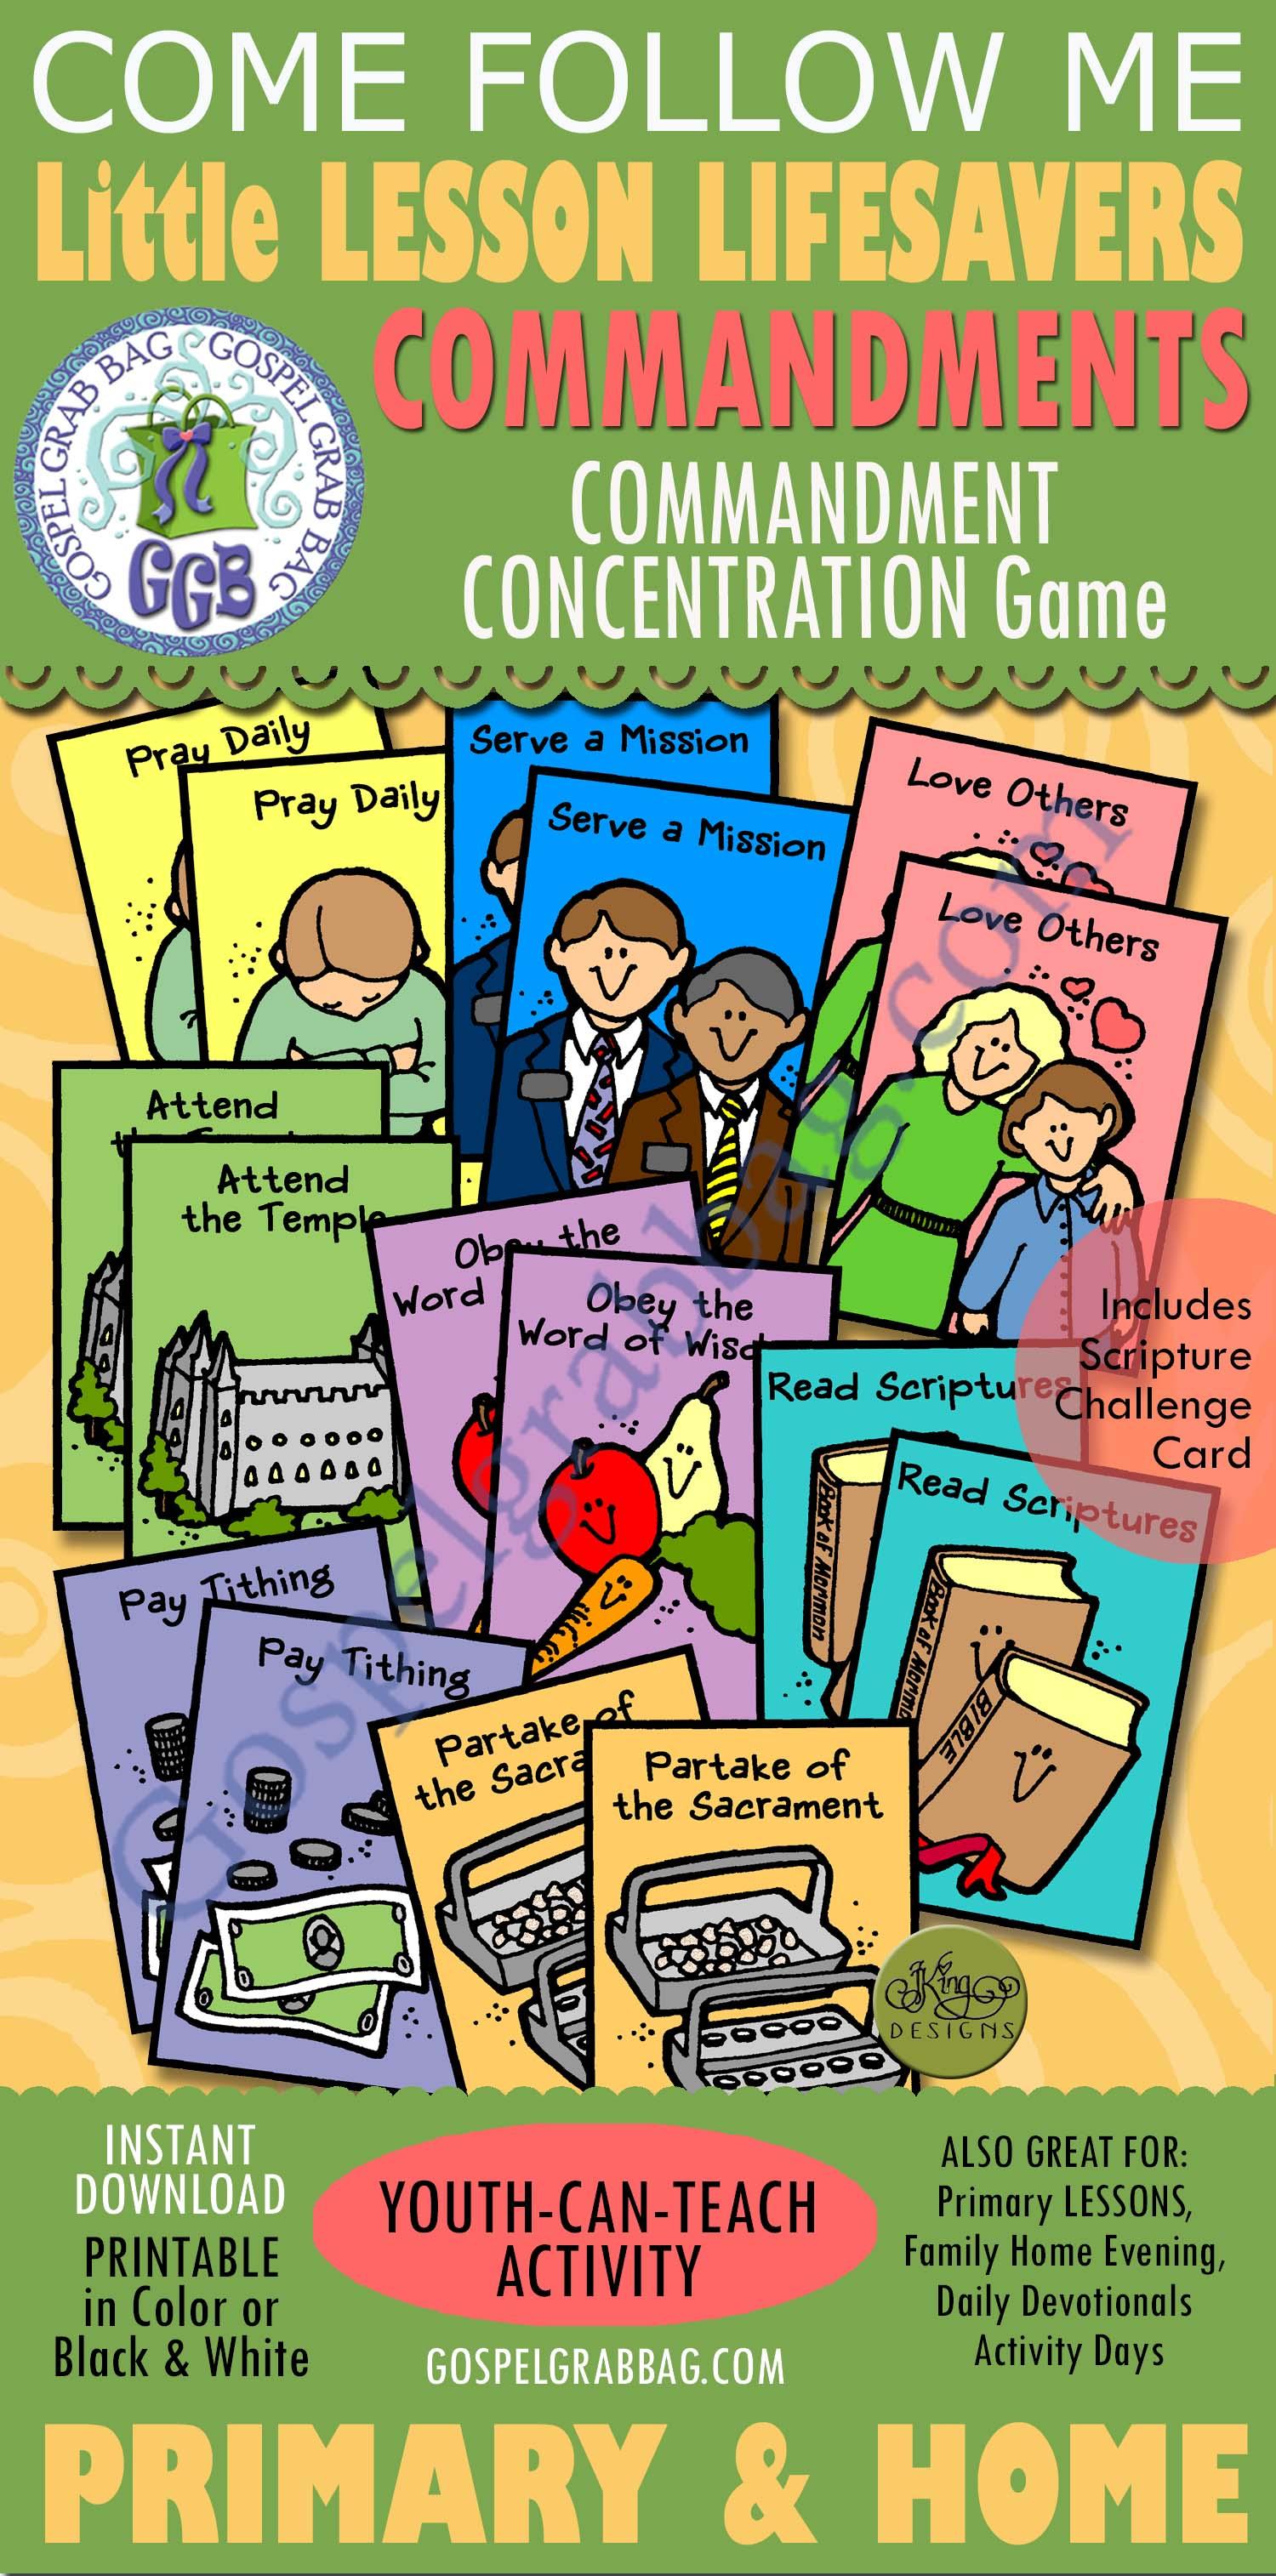 Commandments: Obtaining the Brass Plates, Primary 4 manual, Book of Mormon  Lesson 3 - Gospel Grab Bag